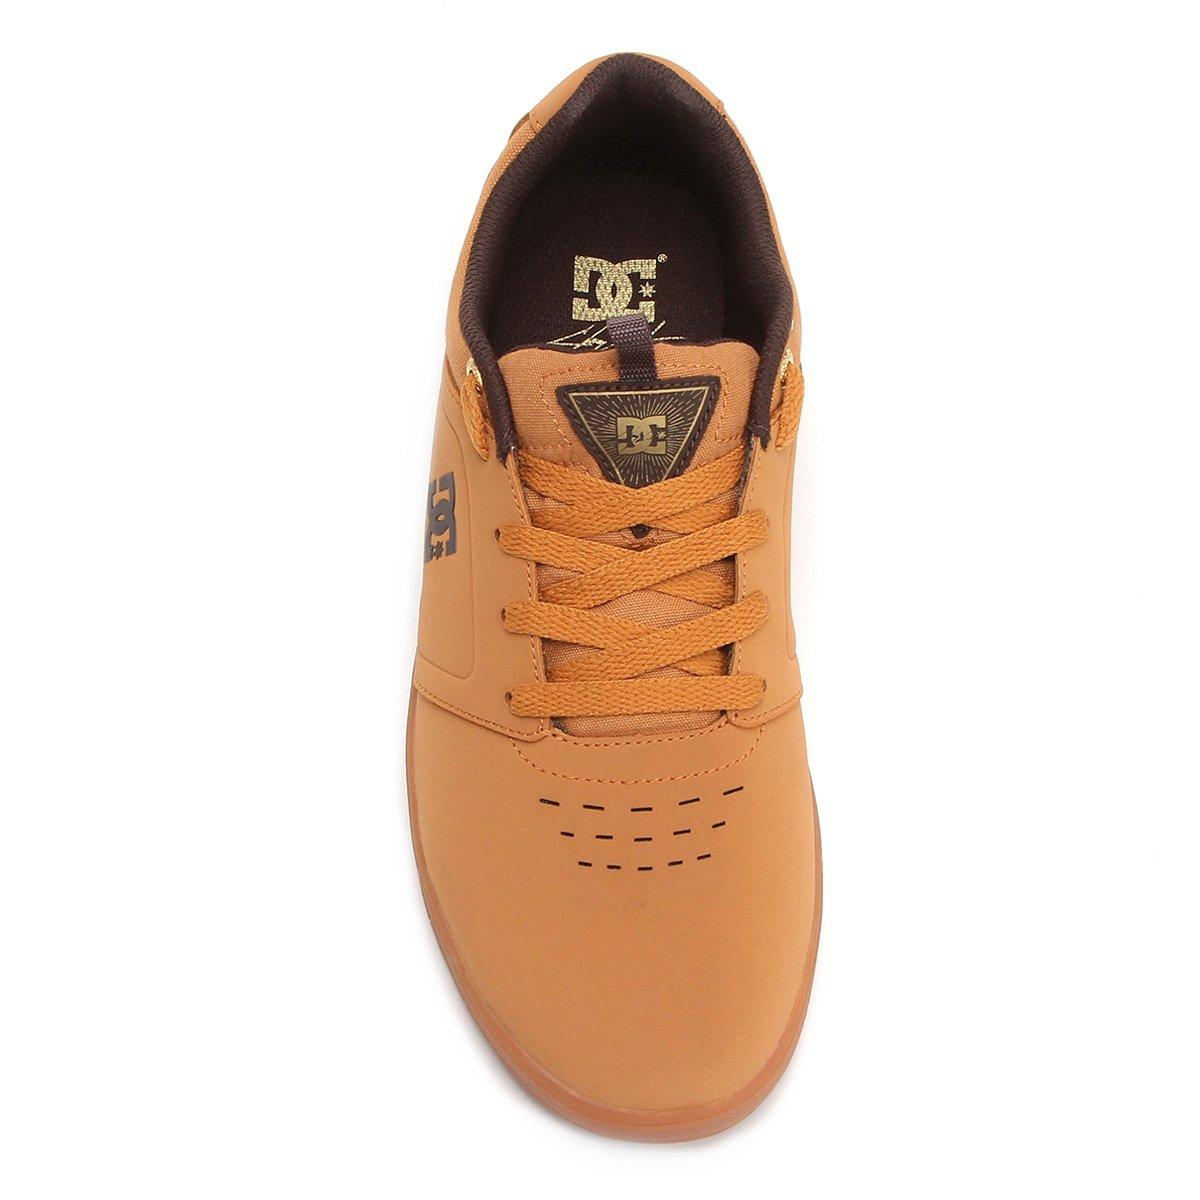 c06d95f32a Tênis Caramelo Shoes Tênis DC DC Masculino Cole Signature 5WqFHH0nwR ...